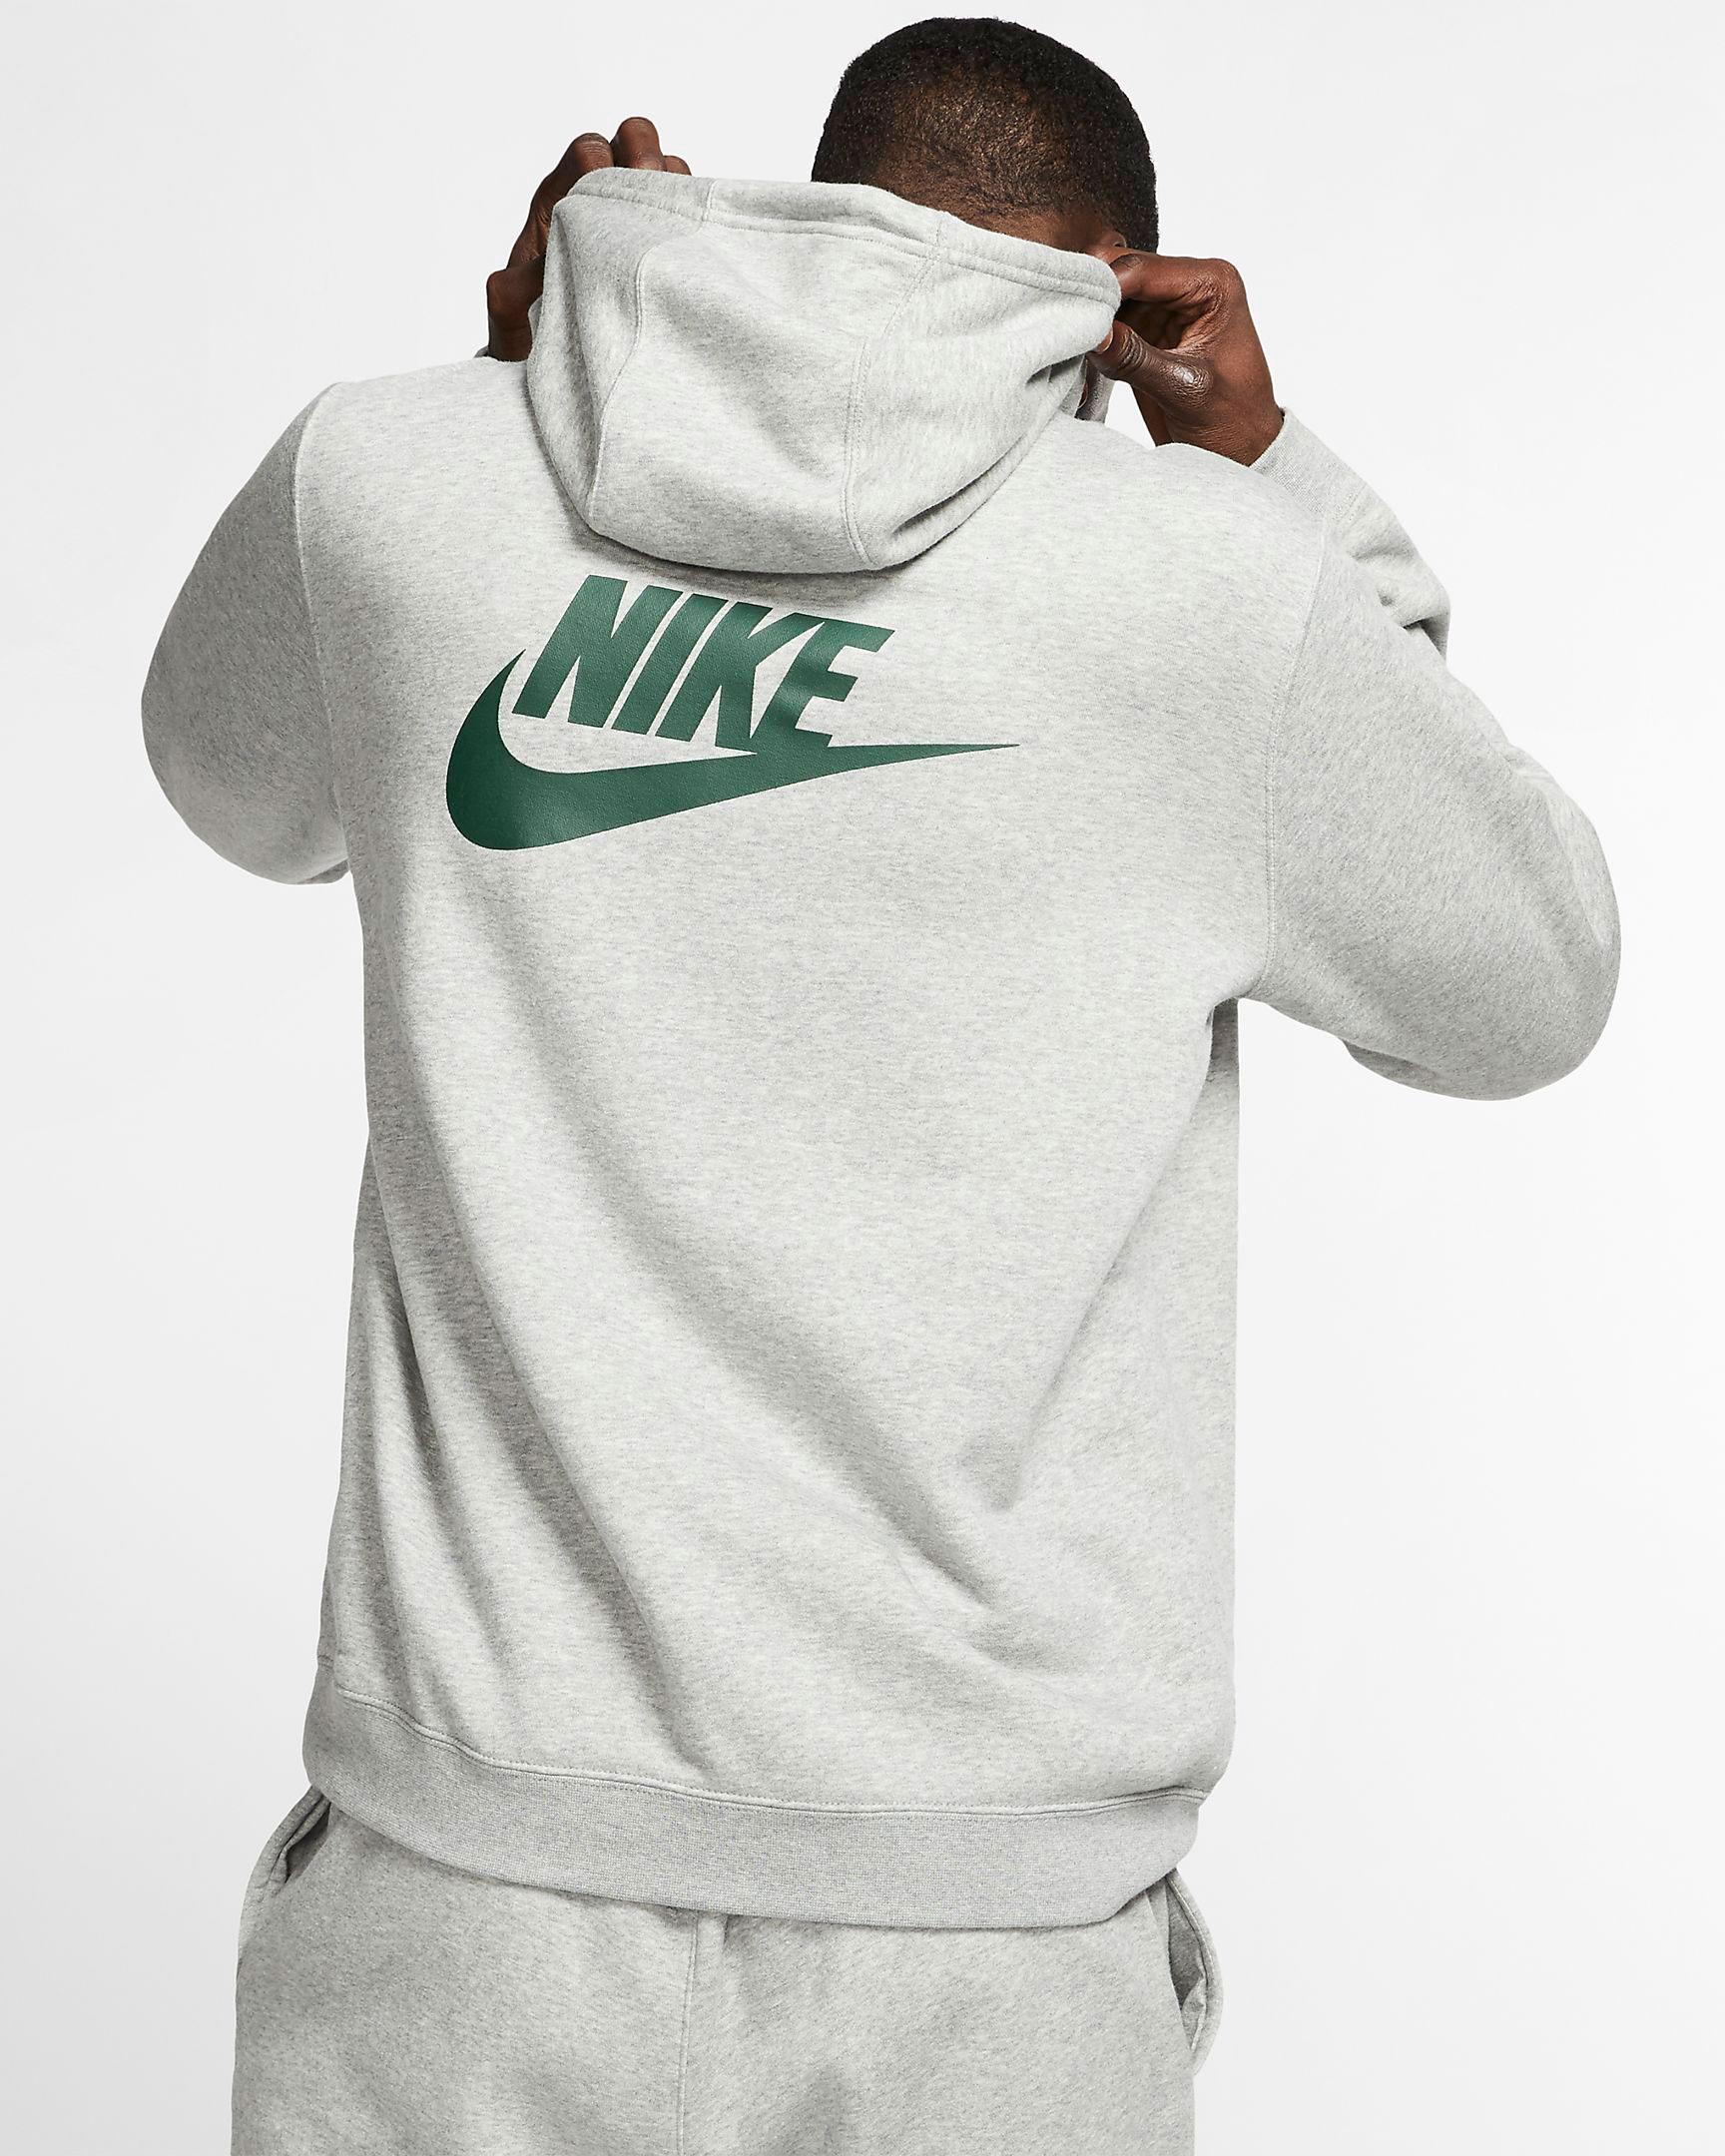 Nike Stranger Things Hawkins High